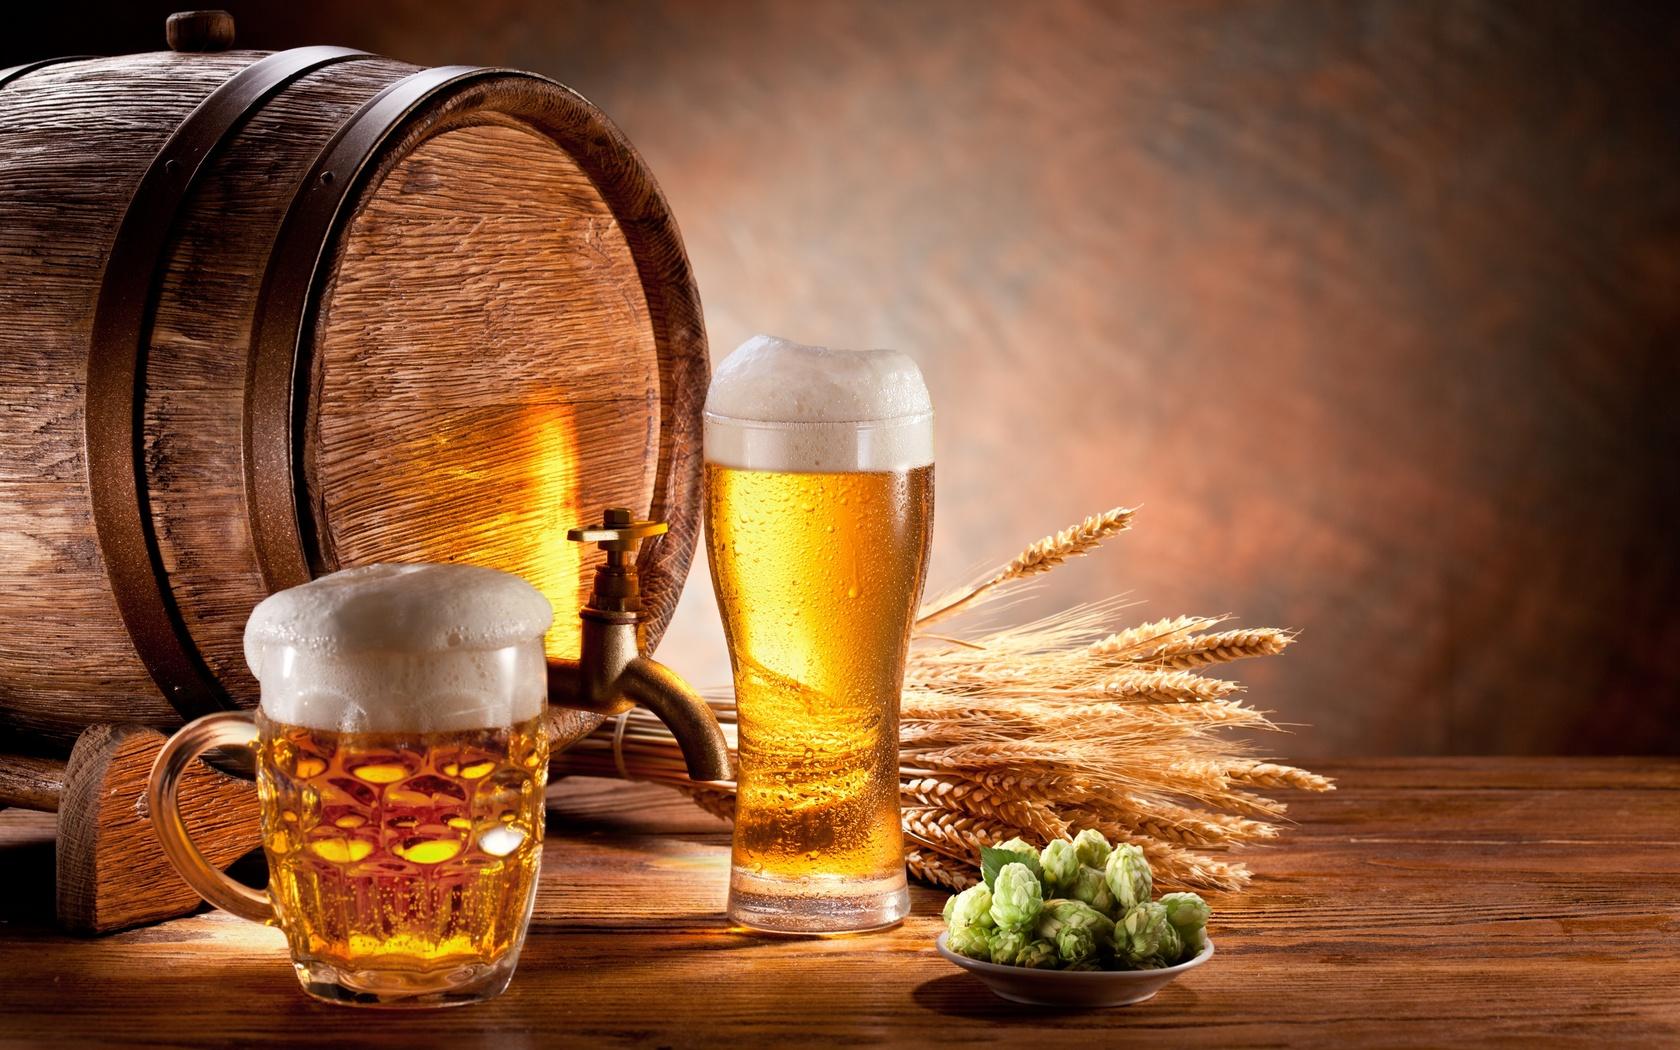 Пиво в стакане на фоне бочки